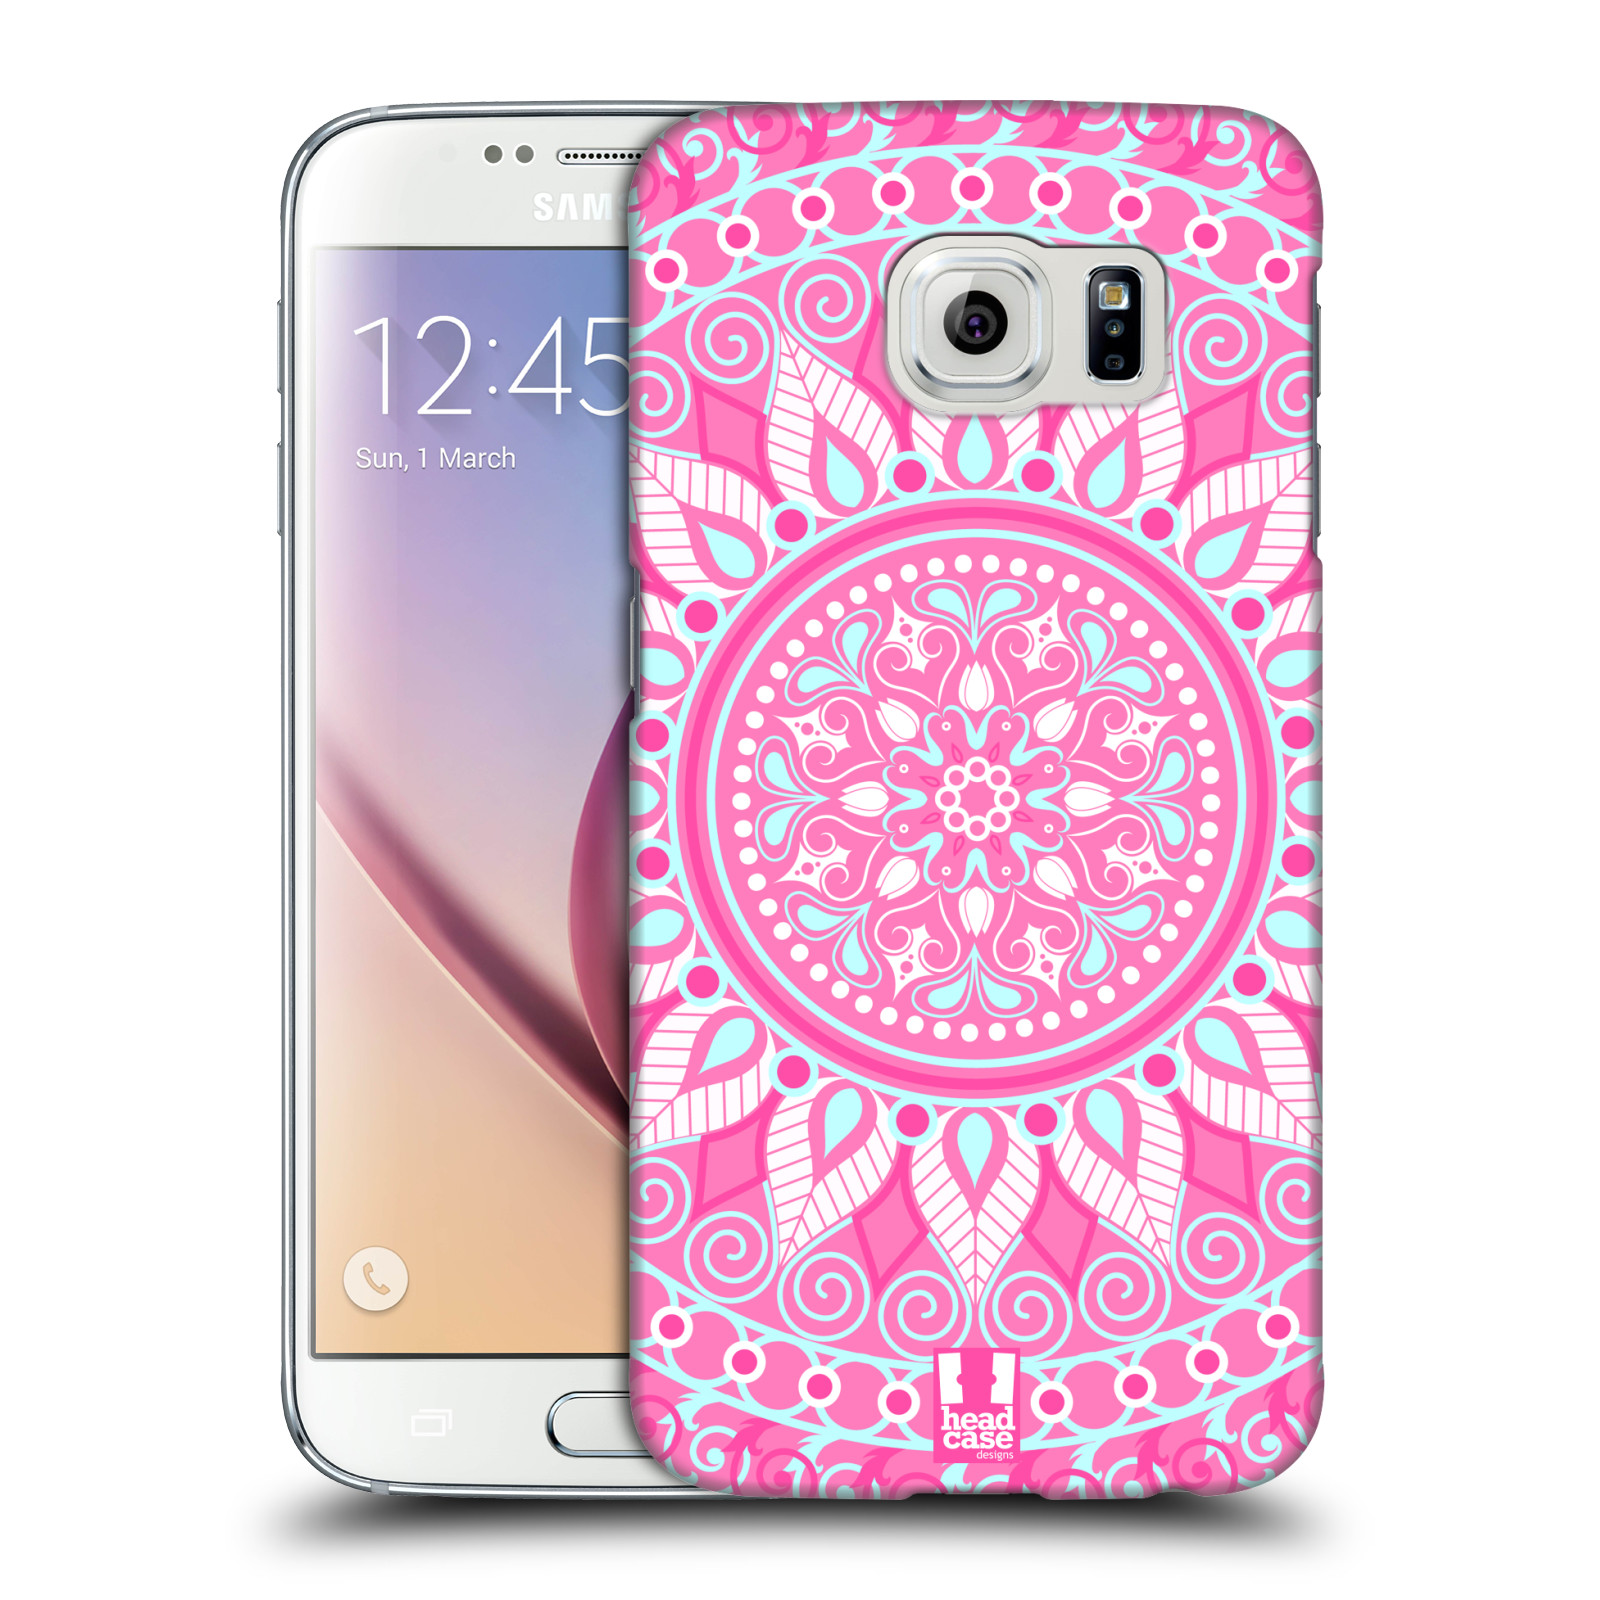 HEAD CASE DESIGNS MANDALA HARD BACK CASE FOR SAMSUNG PHONES 1